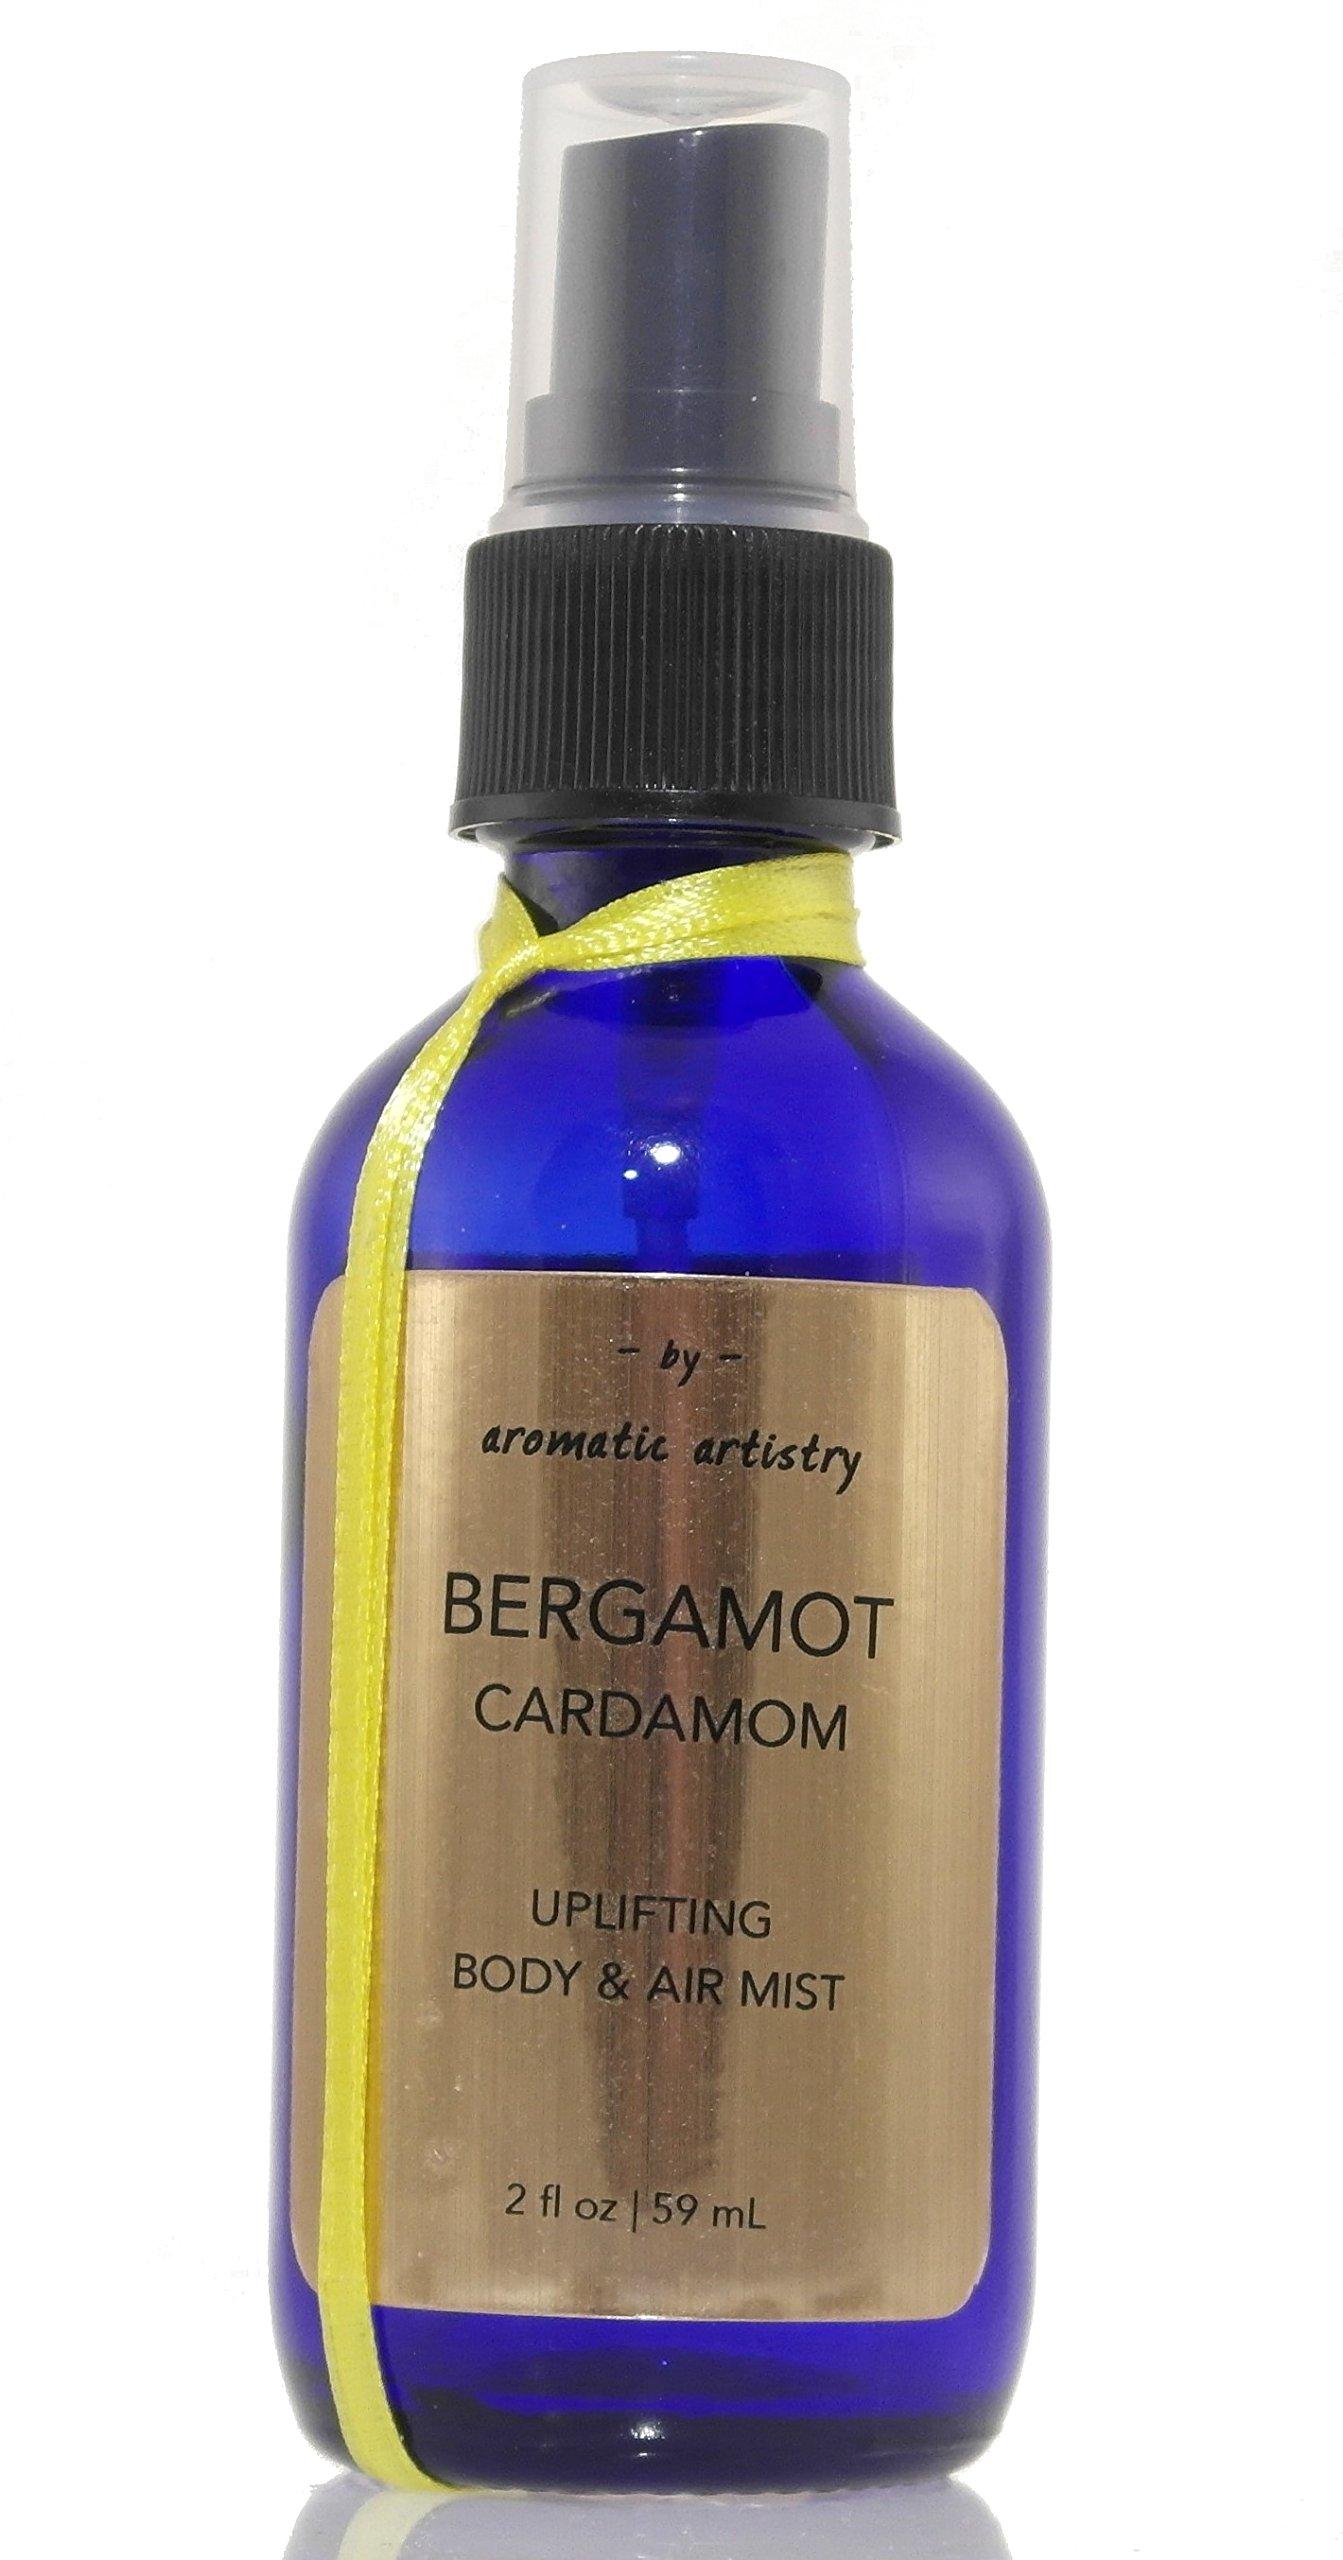 Air & Body Mist - Mood Uplifting - Bergamot || Cardamom 100% ALL NATURAL Therapeutic Grade Premium Essential Oils